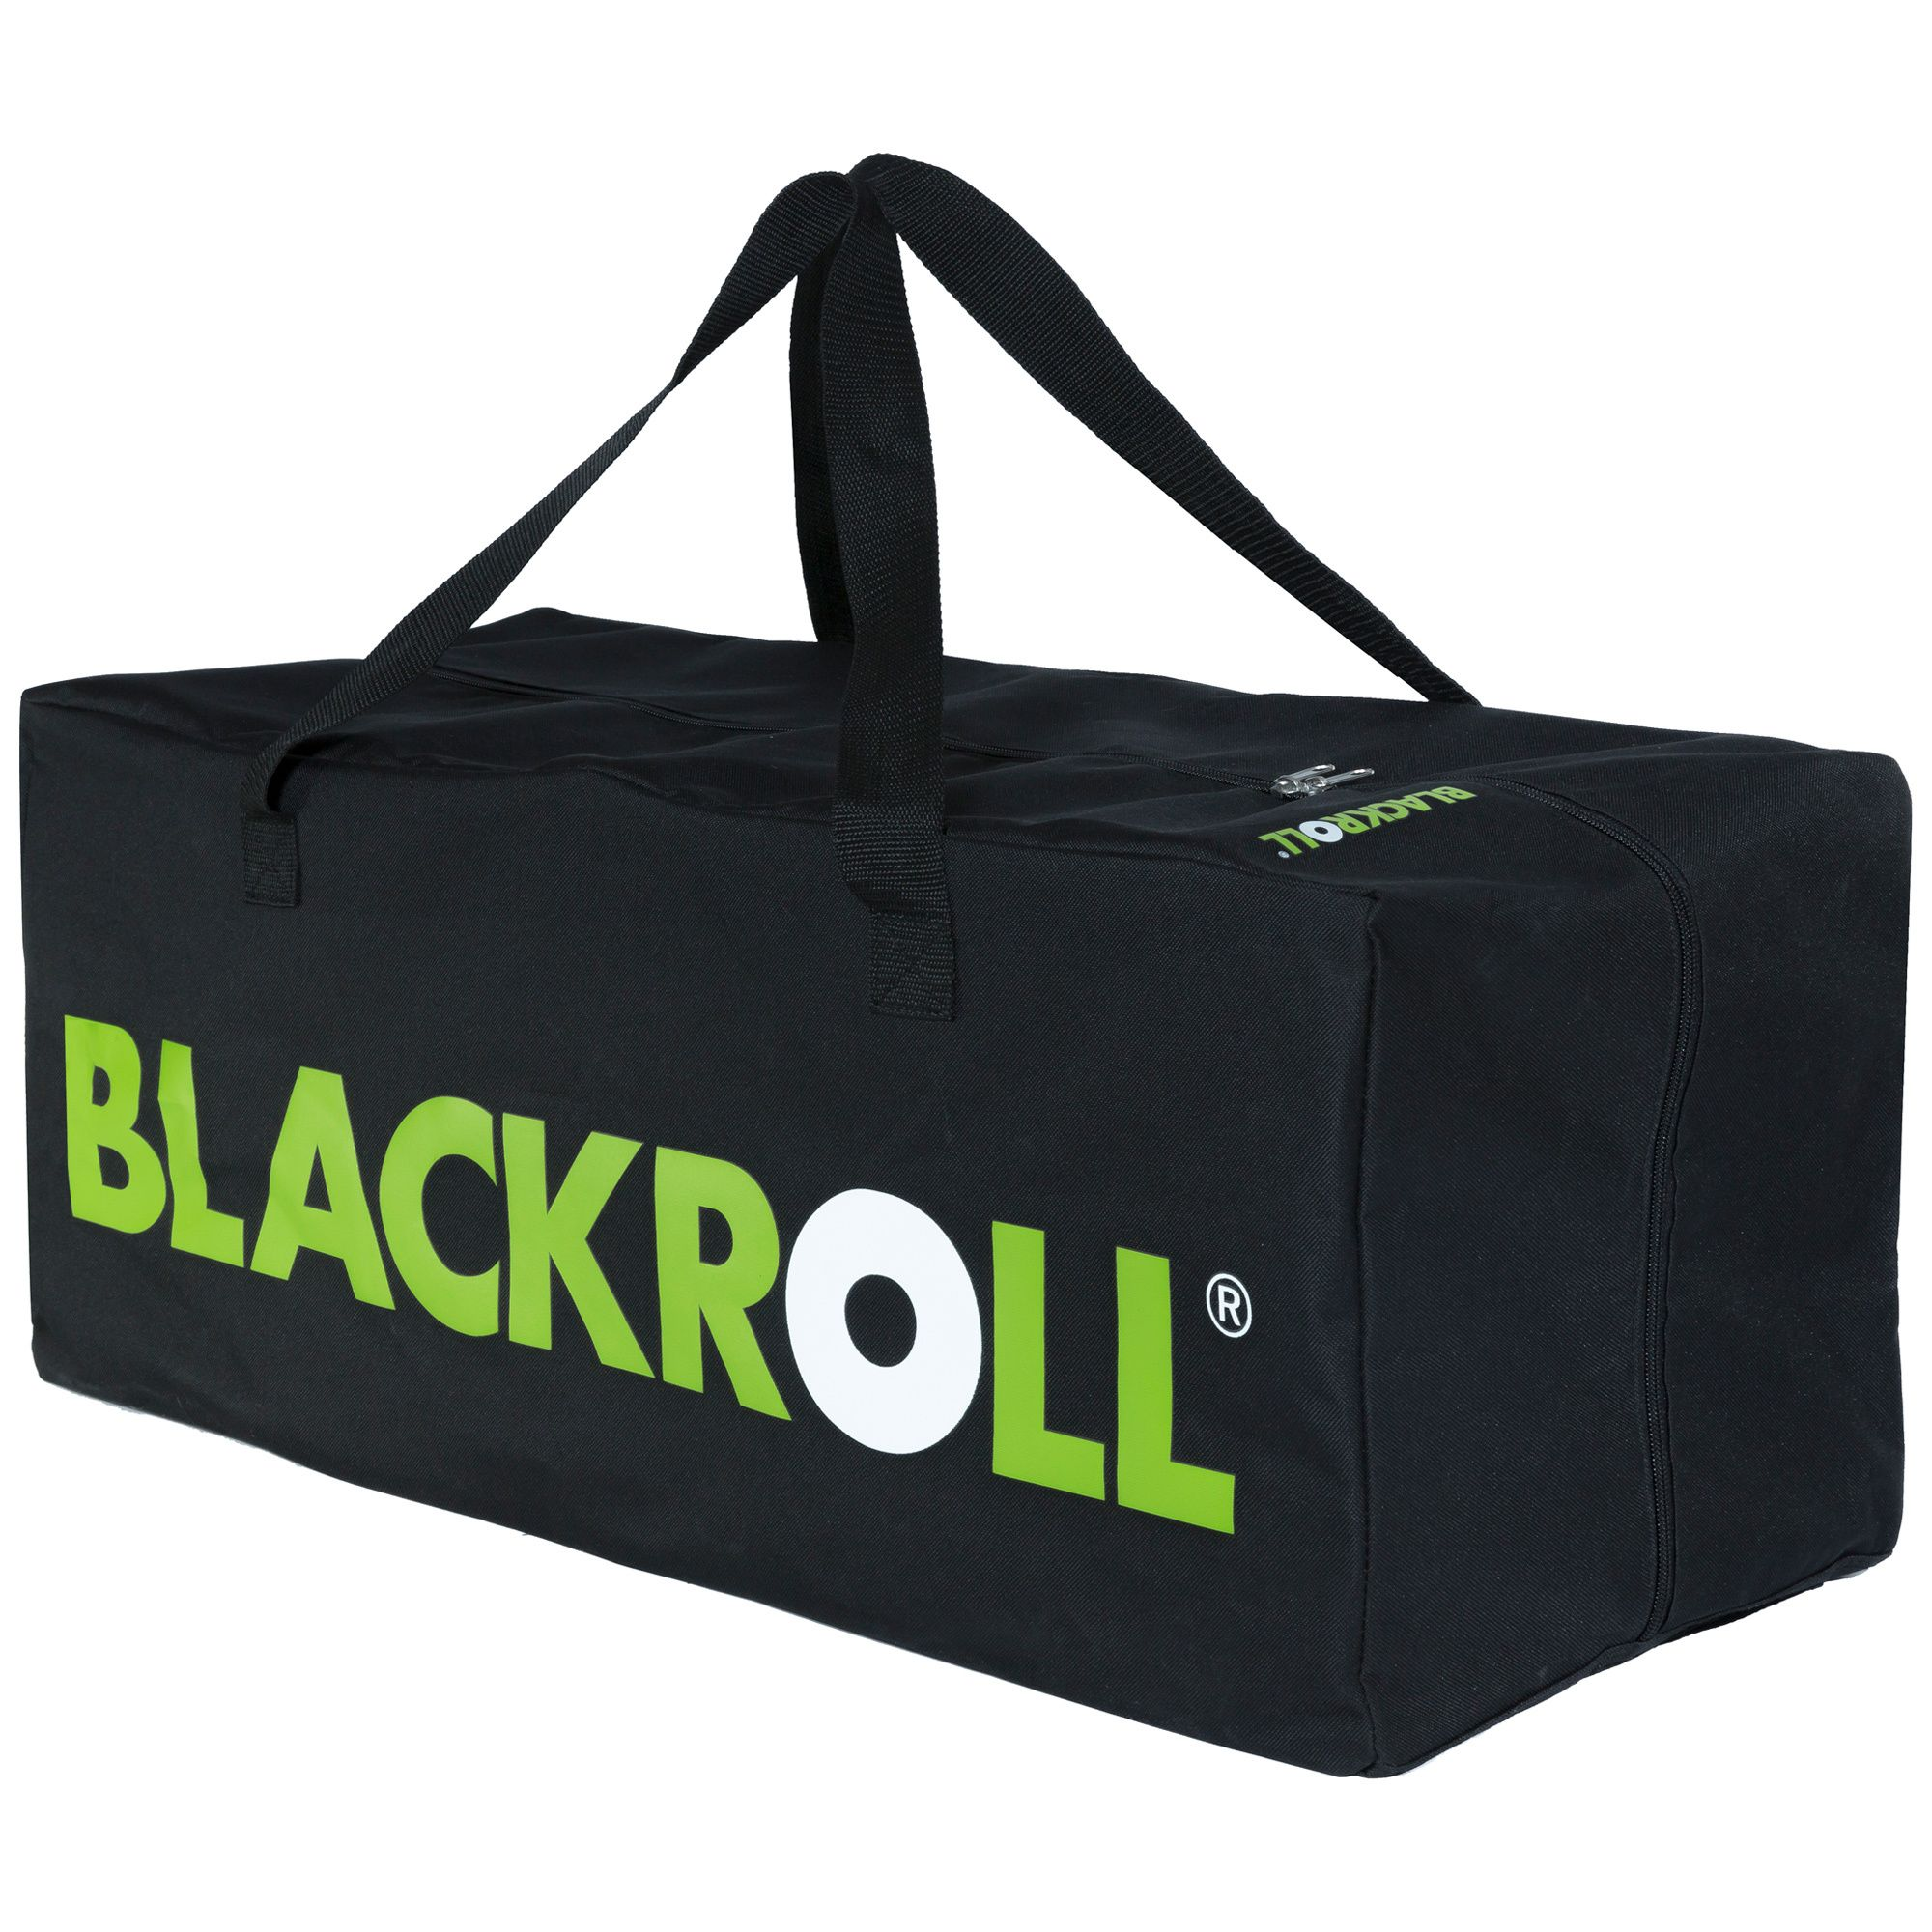 BLACKROLL  Blackroll Trainer Tragetasche